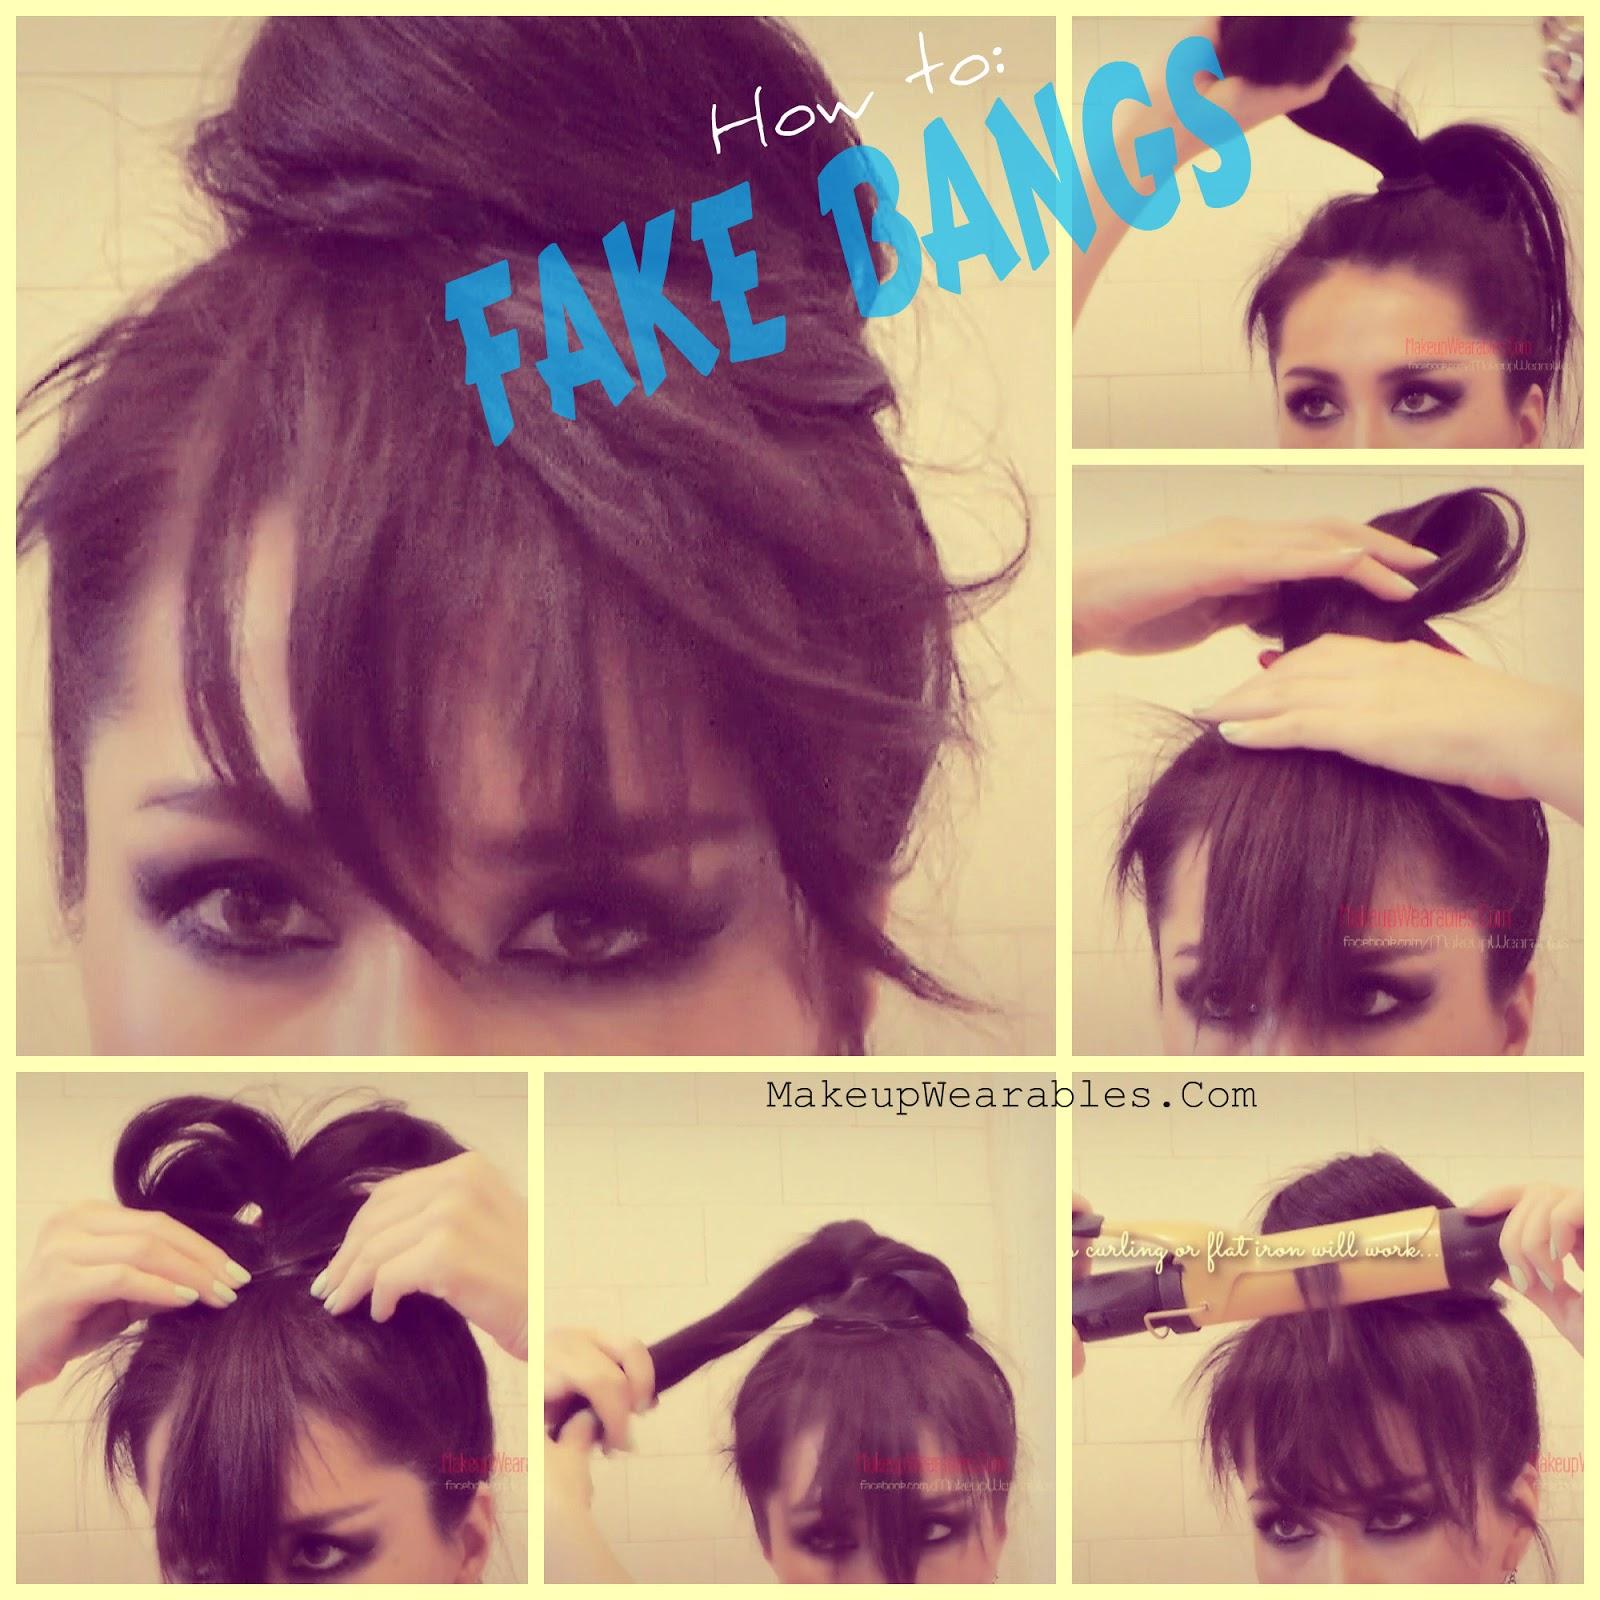 Outstanding How To Fake Bangs Cute Easy Bun Hairstyles Hair Tutorial Video Short Hairstyles Gunalazisus